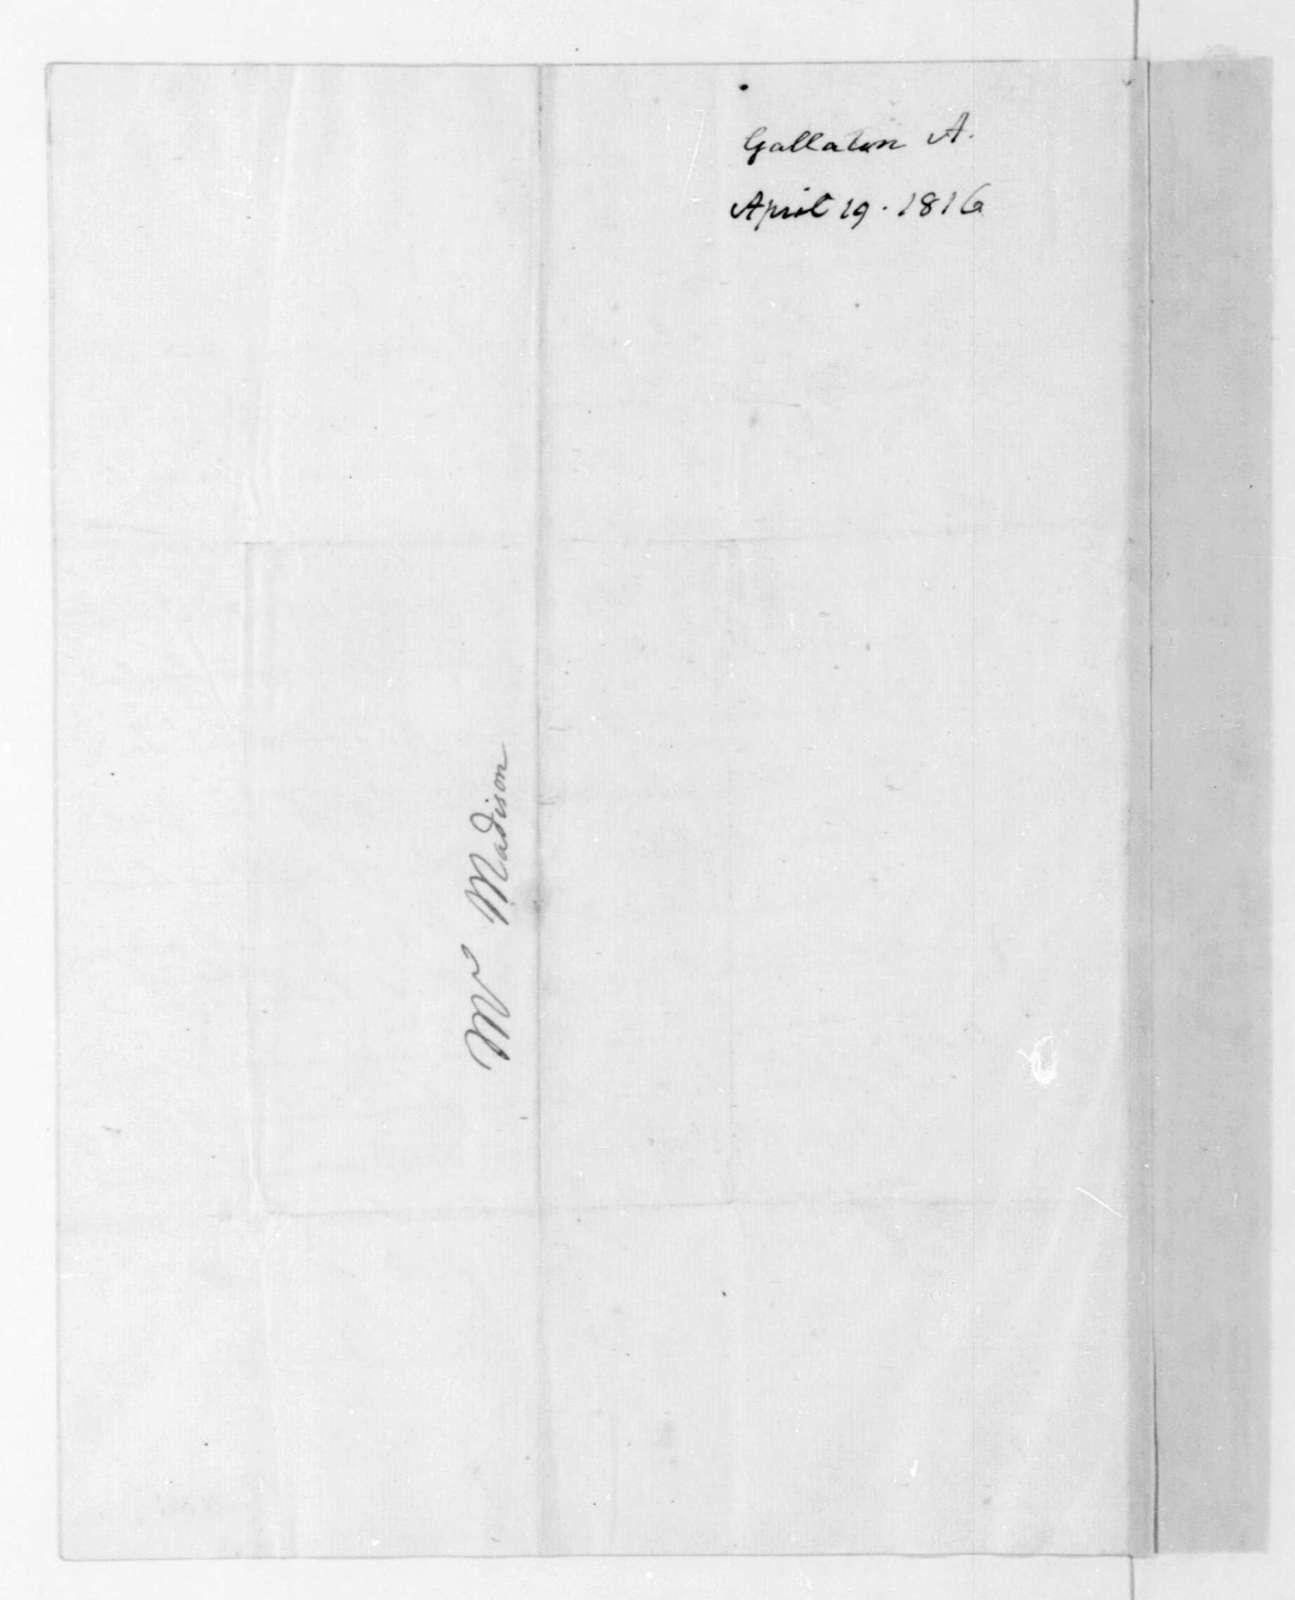 Albert Gallatin to James Madison, April 19, 1816.